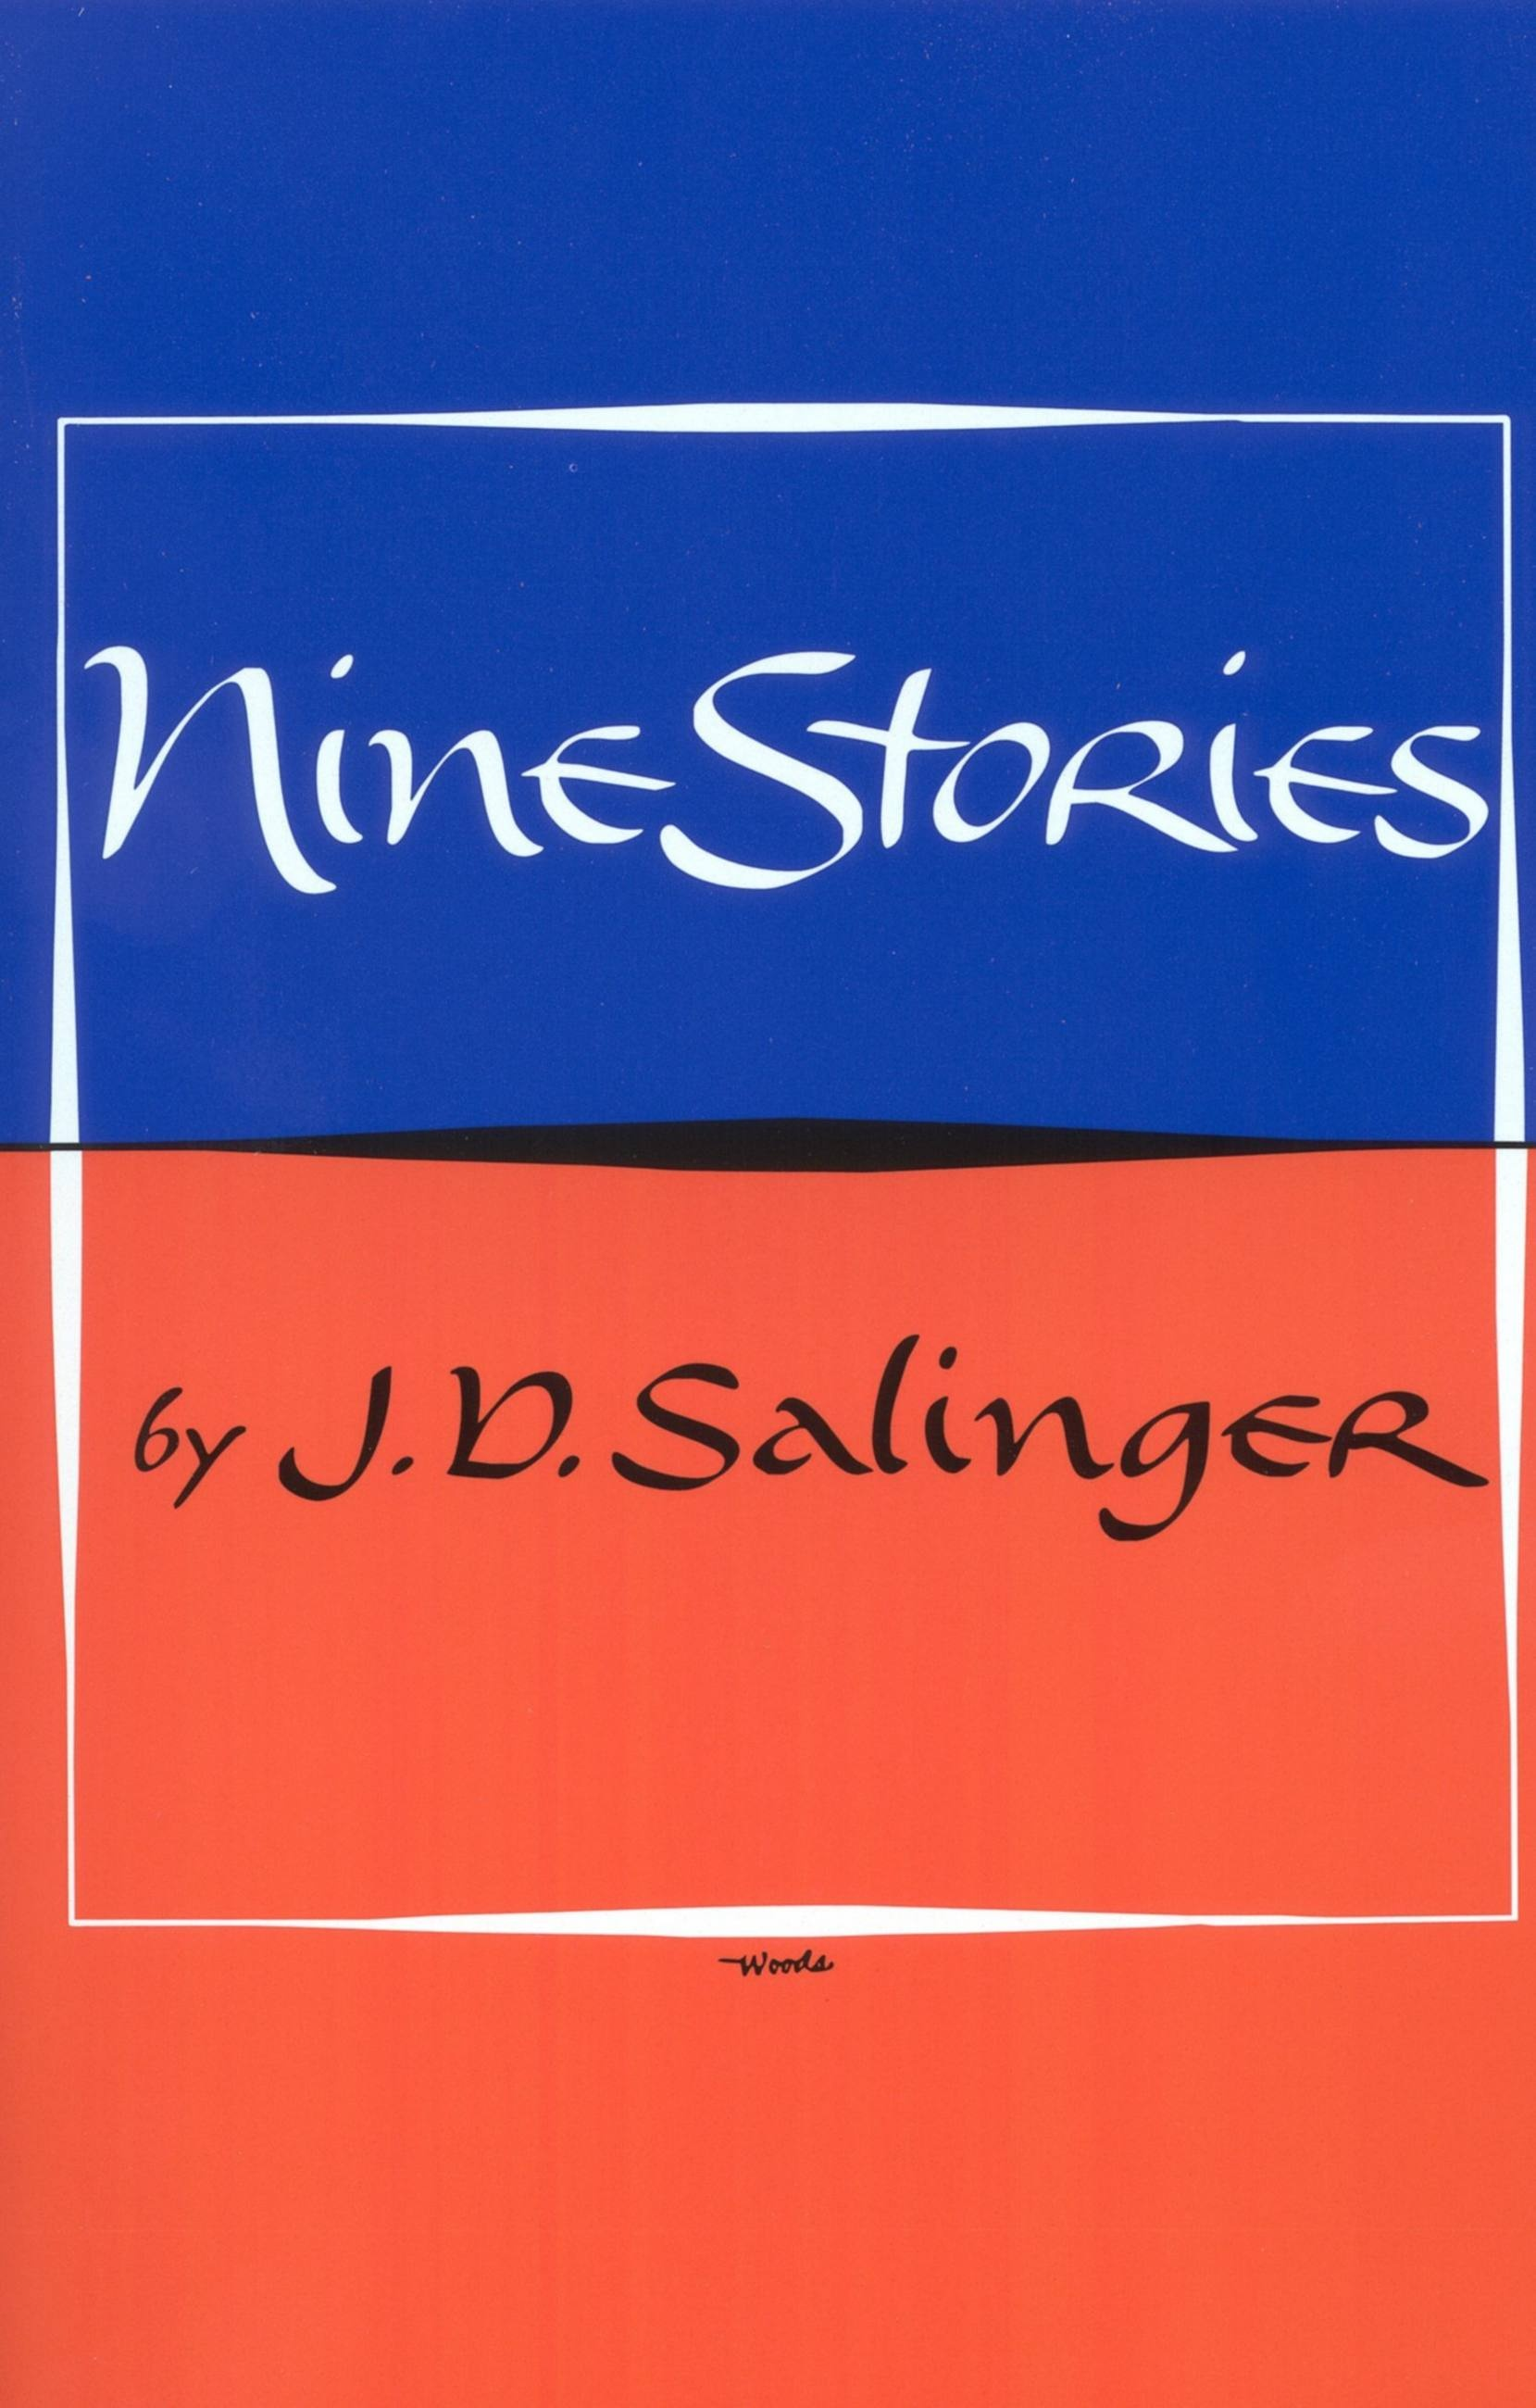 Nine Stories By Jd Salinger Hachette Book Group